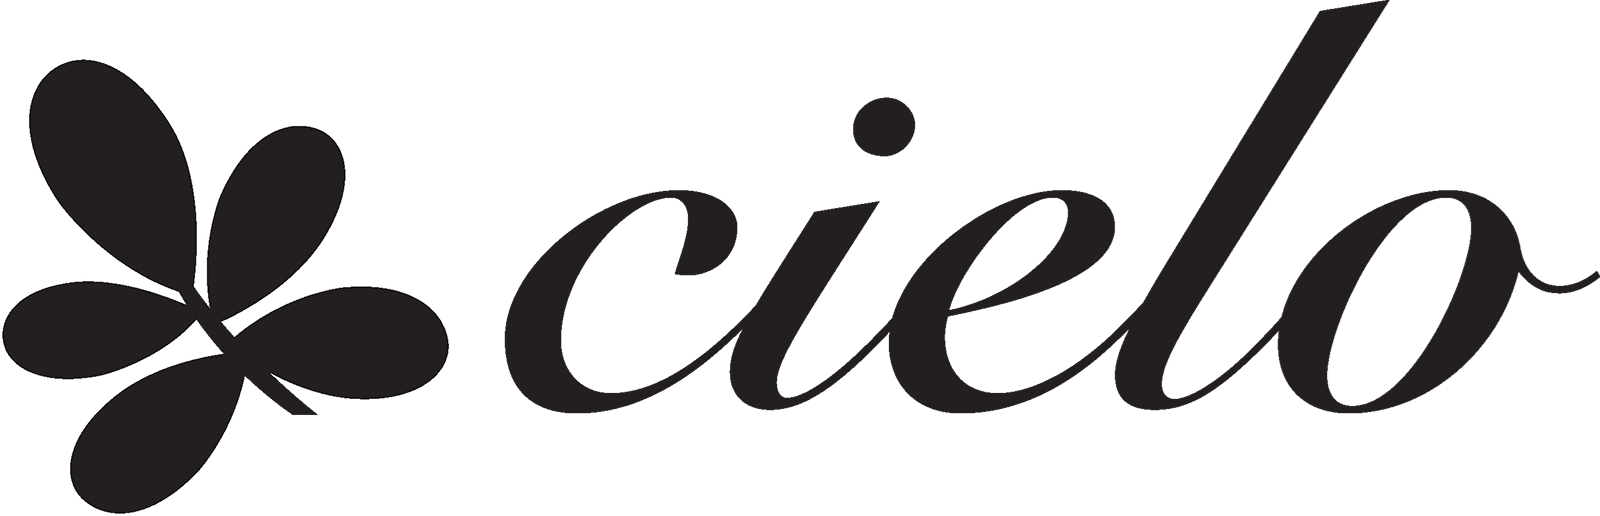 Charlotte Property Logo 55